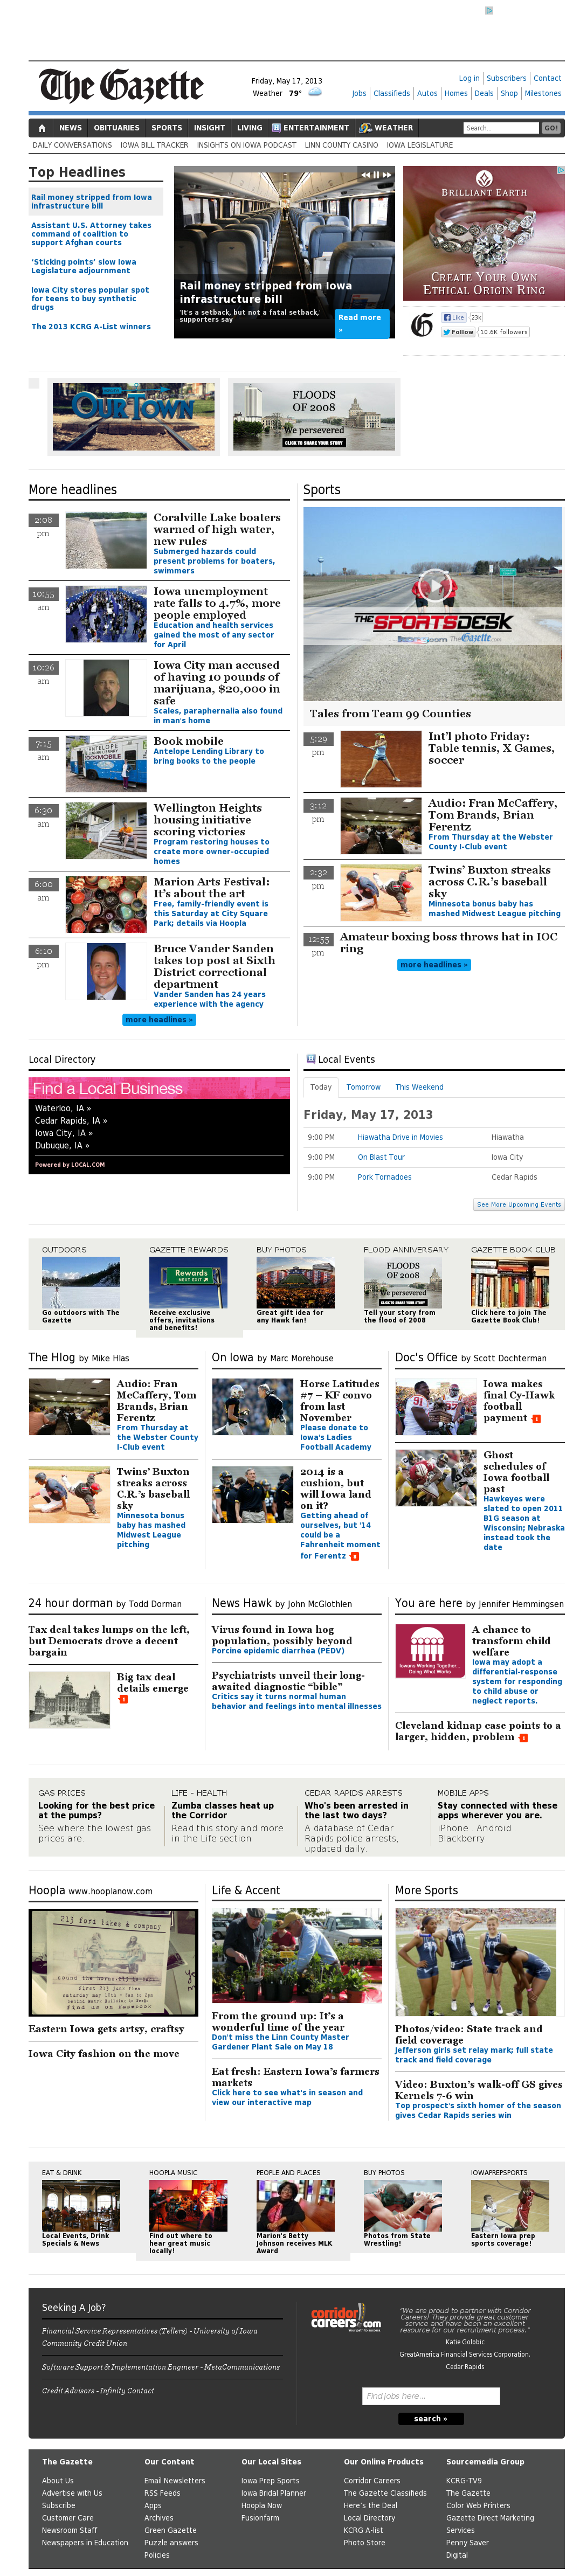 The (Cedar Rapids) Gazette at Saturday May 18, 2013, 1:08 a.m. UTC